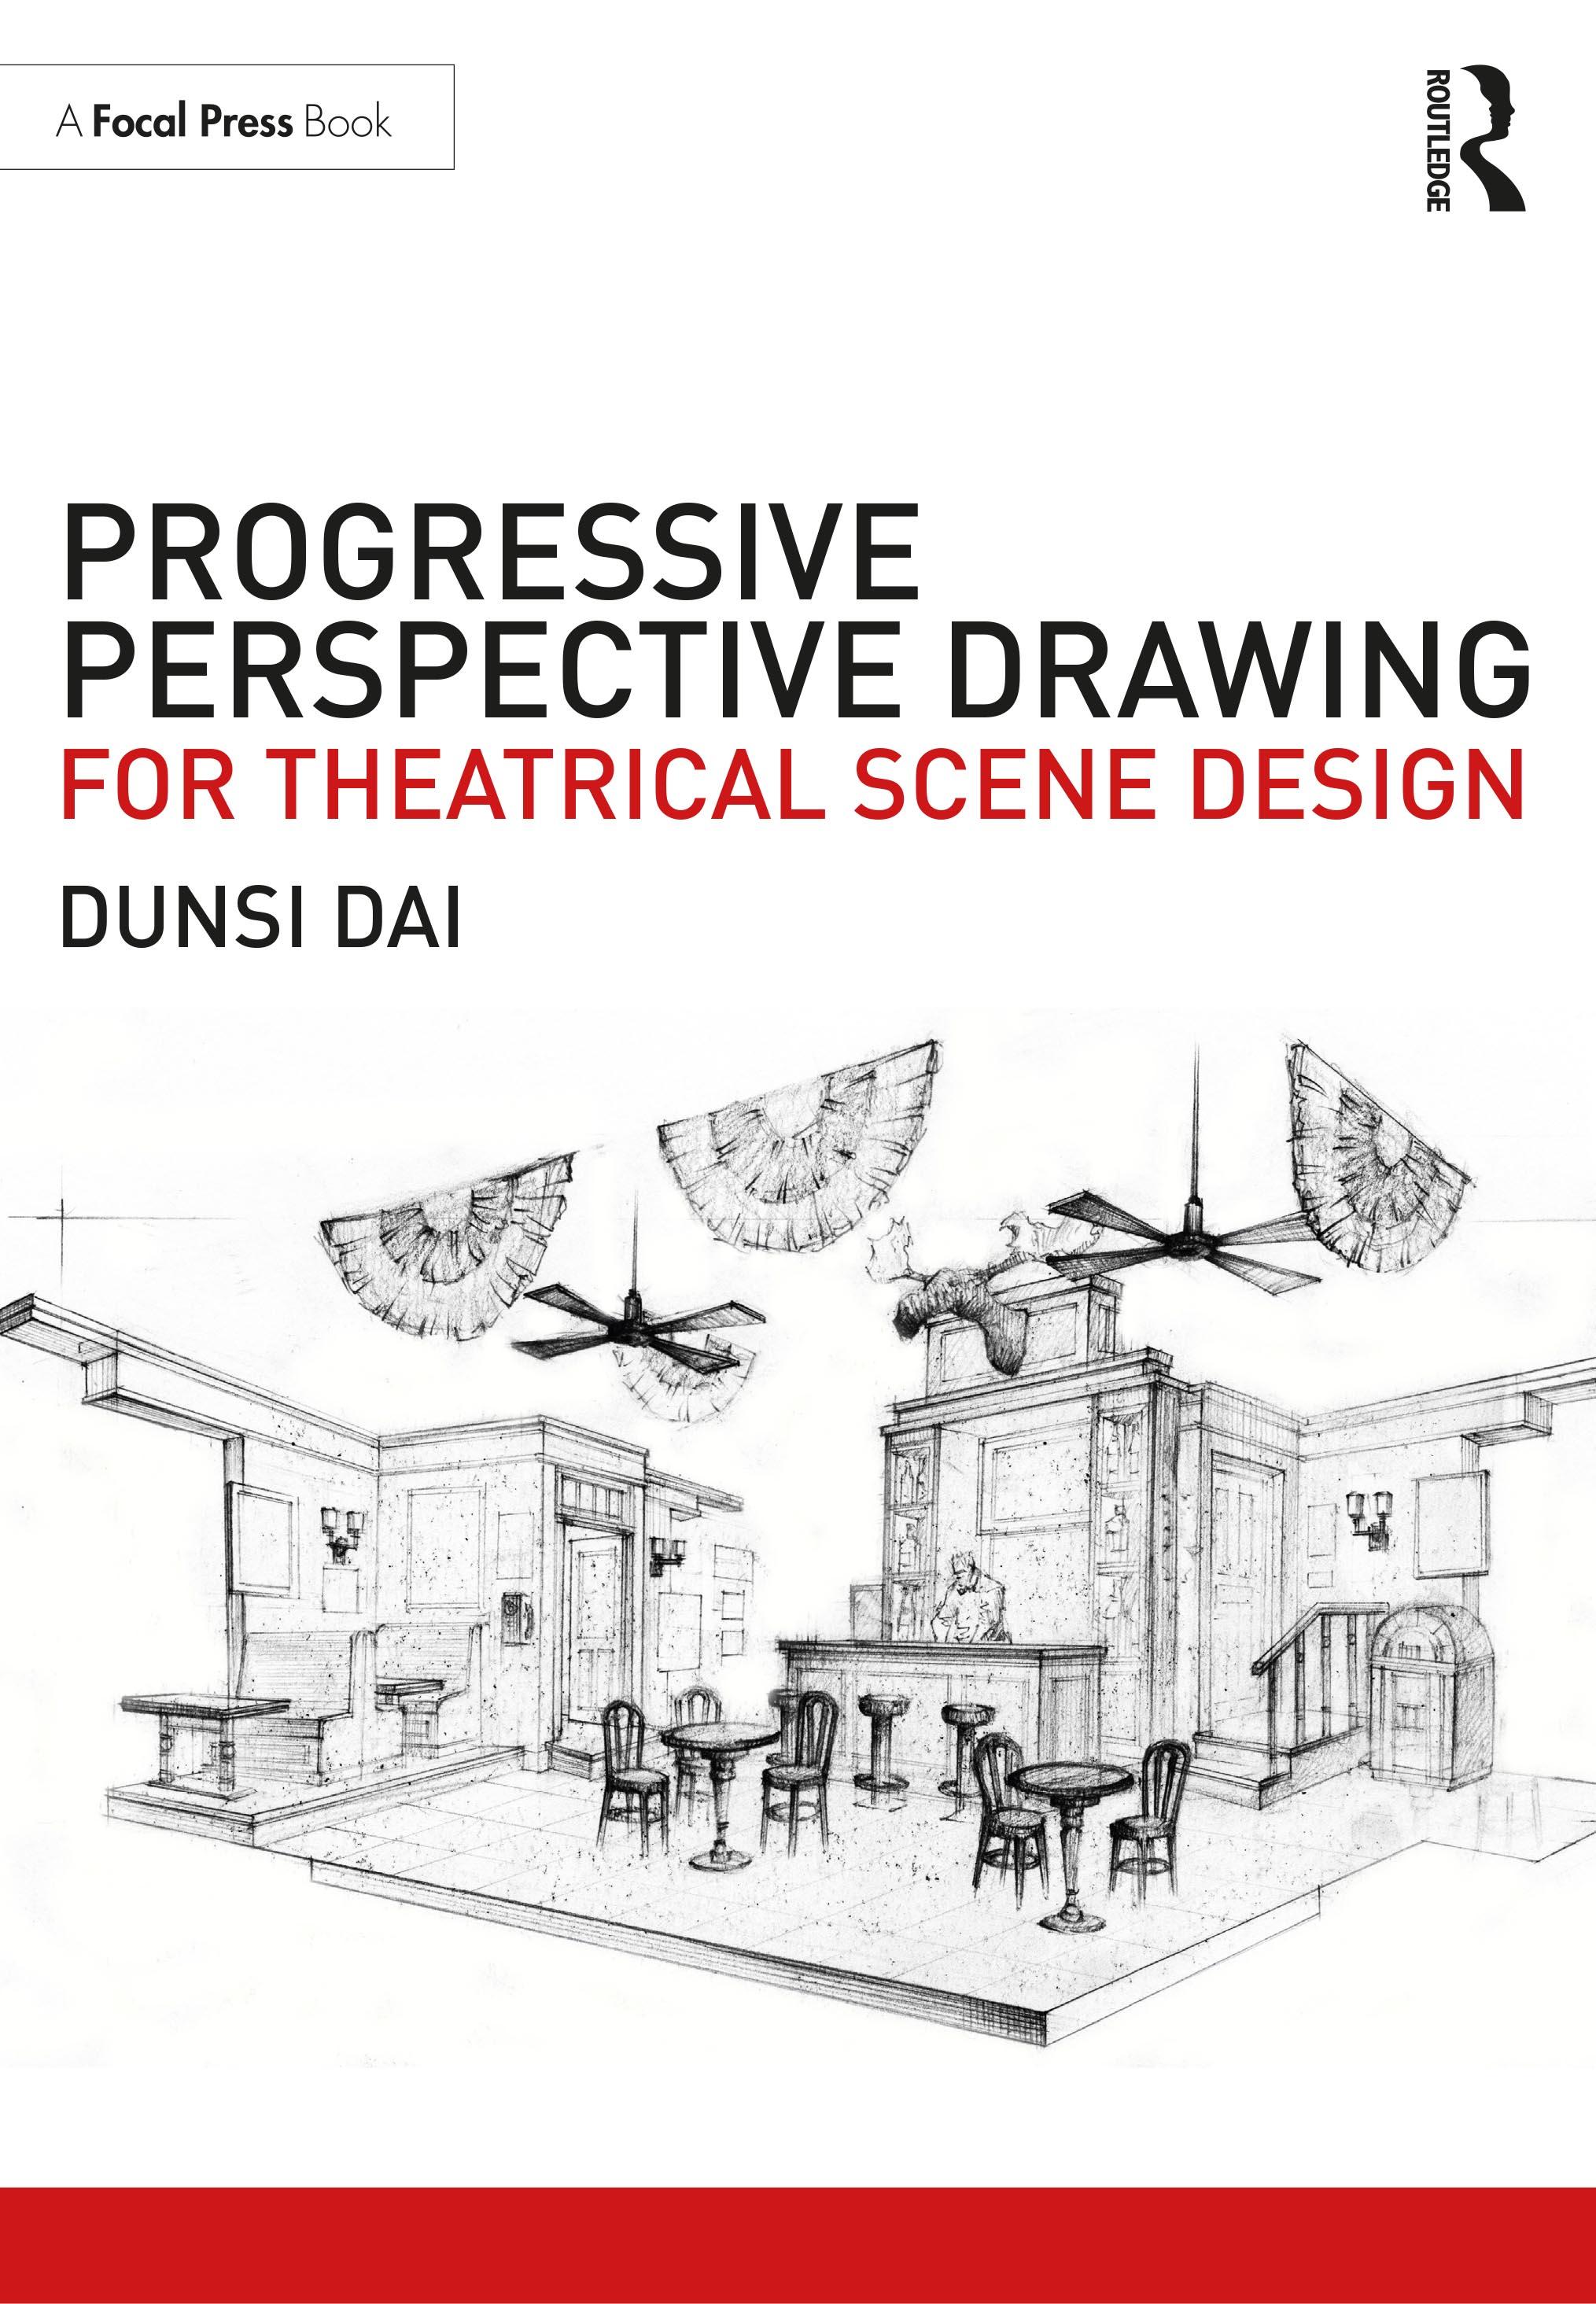 Perspective Drawing Method I: Grid Method